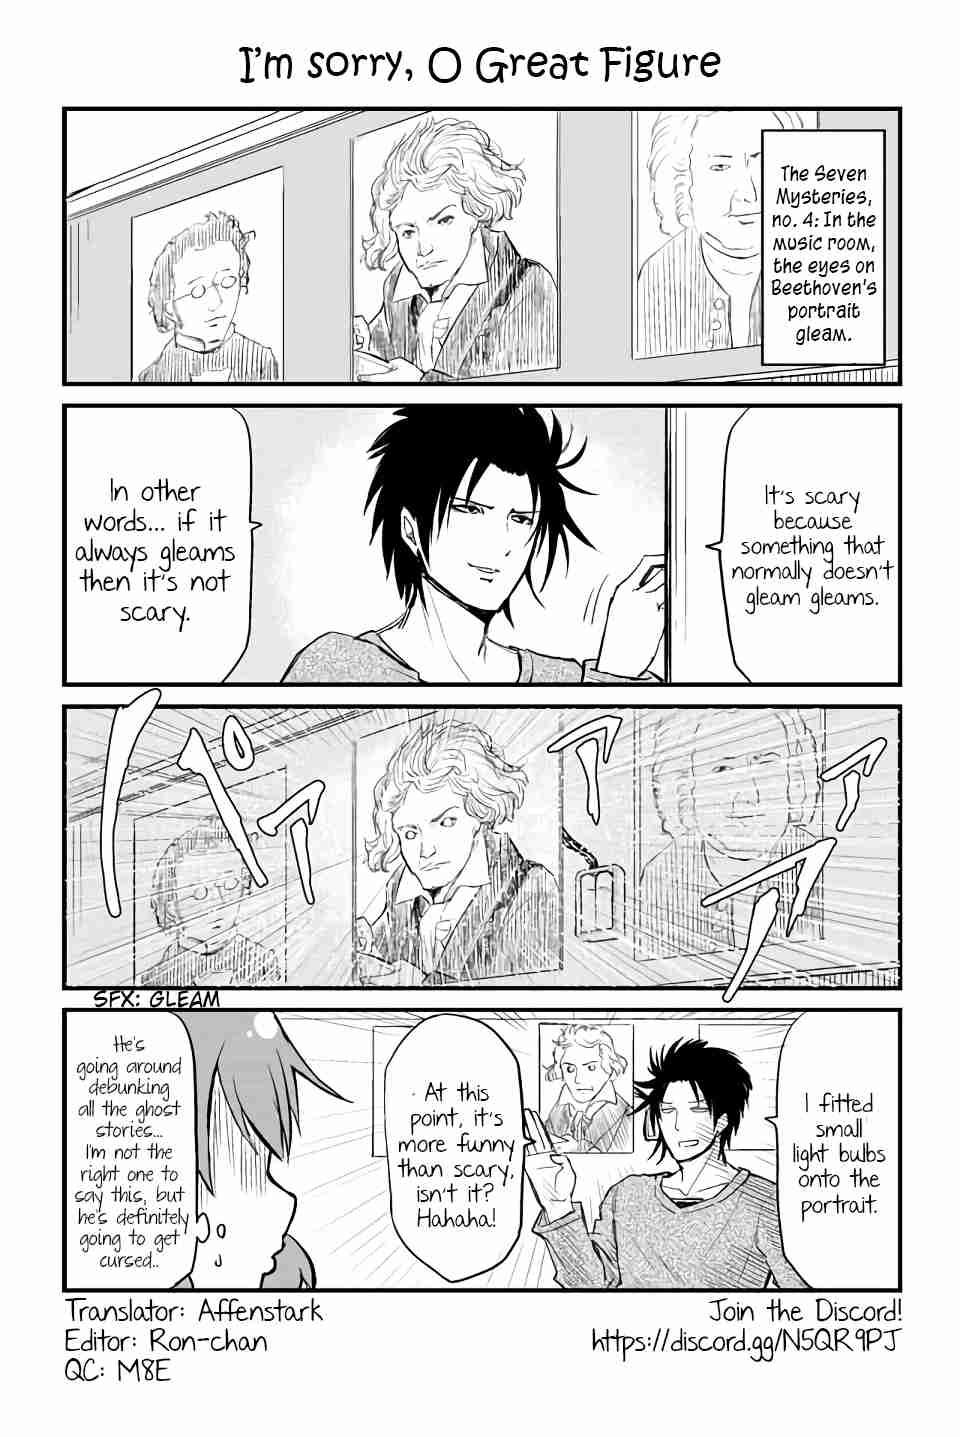 https://manga.mangadogs.com/comics/pic2/18/18194/969358/a060a959e2593a9036a4a9a449f9b304.jpg Page 1